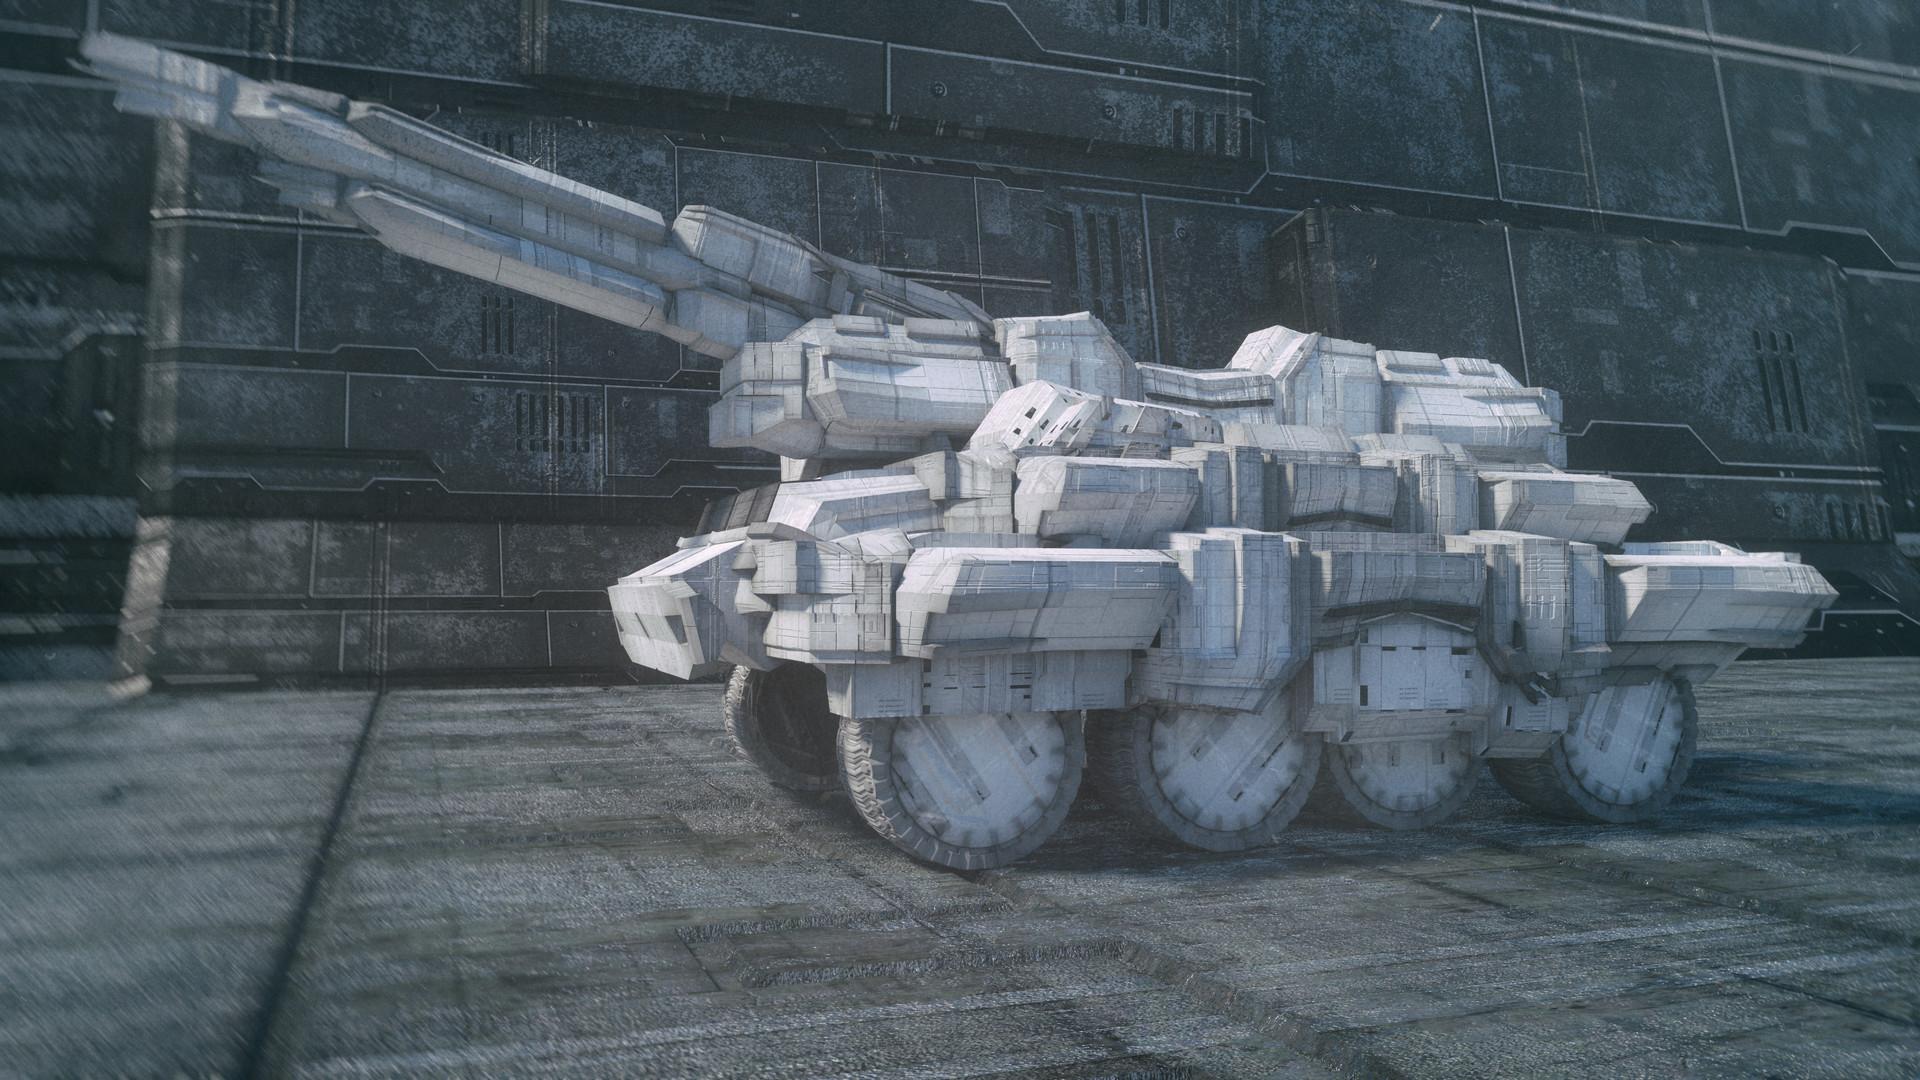 Kresimir jelusic robob3ar 407 231116 crs 23 scifi truck ps